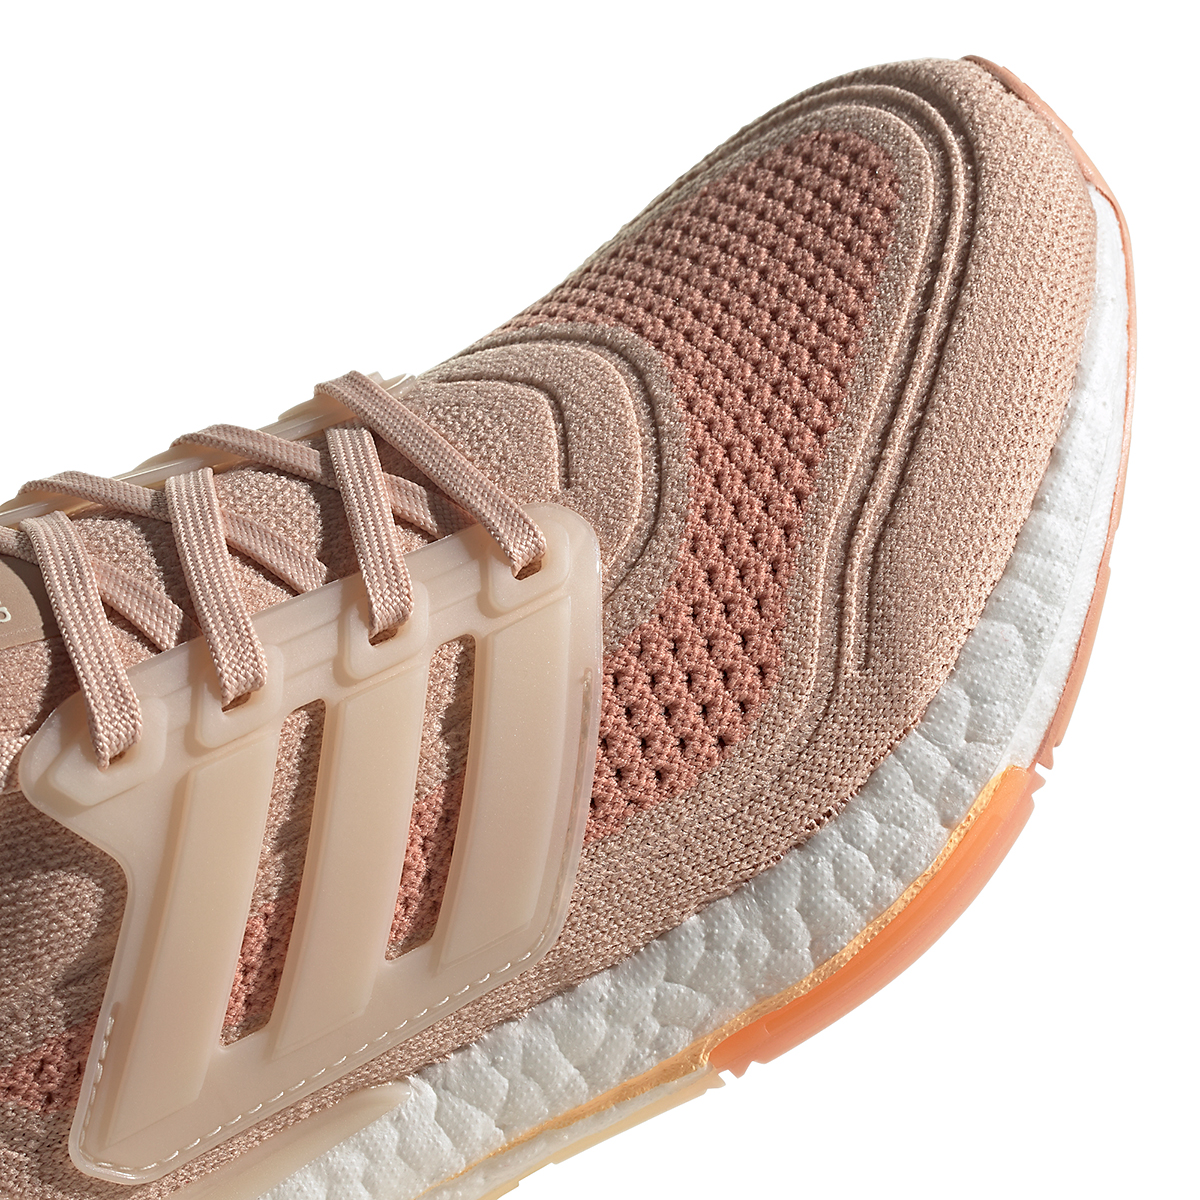 Women's Adidas Ultraboost 21 Running Shoe - Color: Halo Blush/Wonder White/Ambient Blush - Size: 5 - Width: Regular, Halo Blush/Wonder White/Ambient Blush, large, image 6